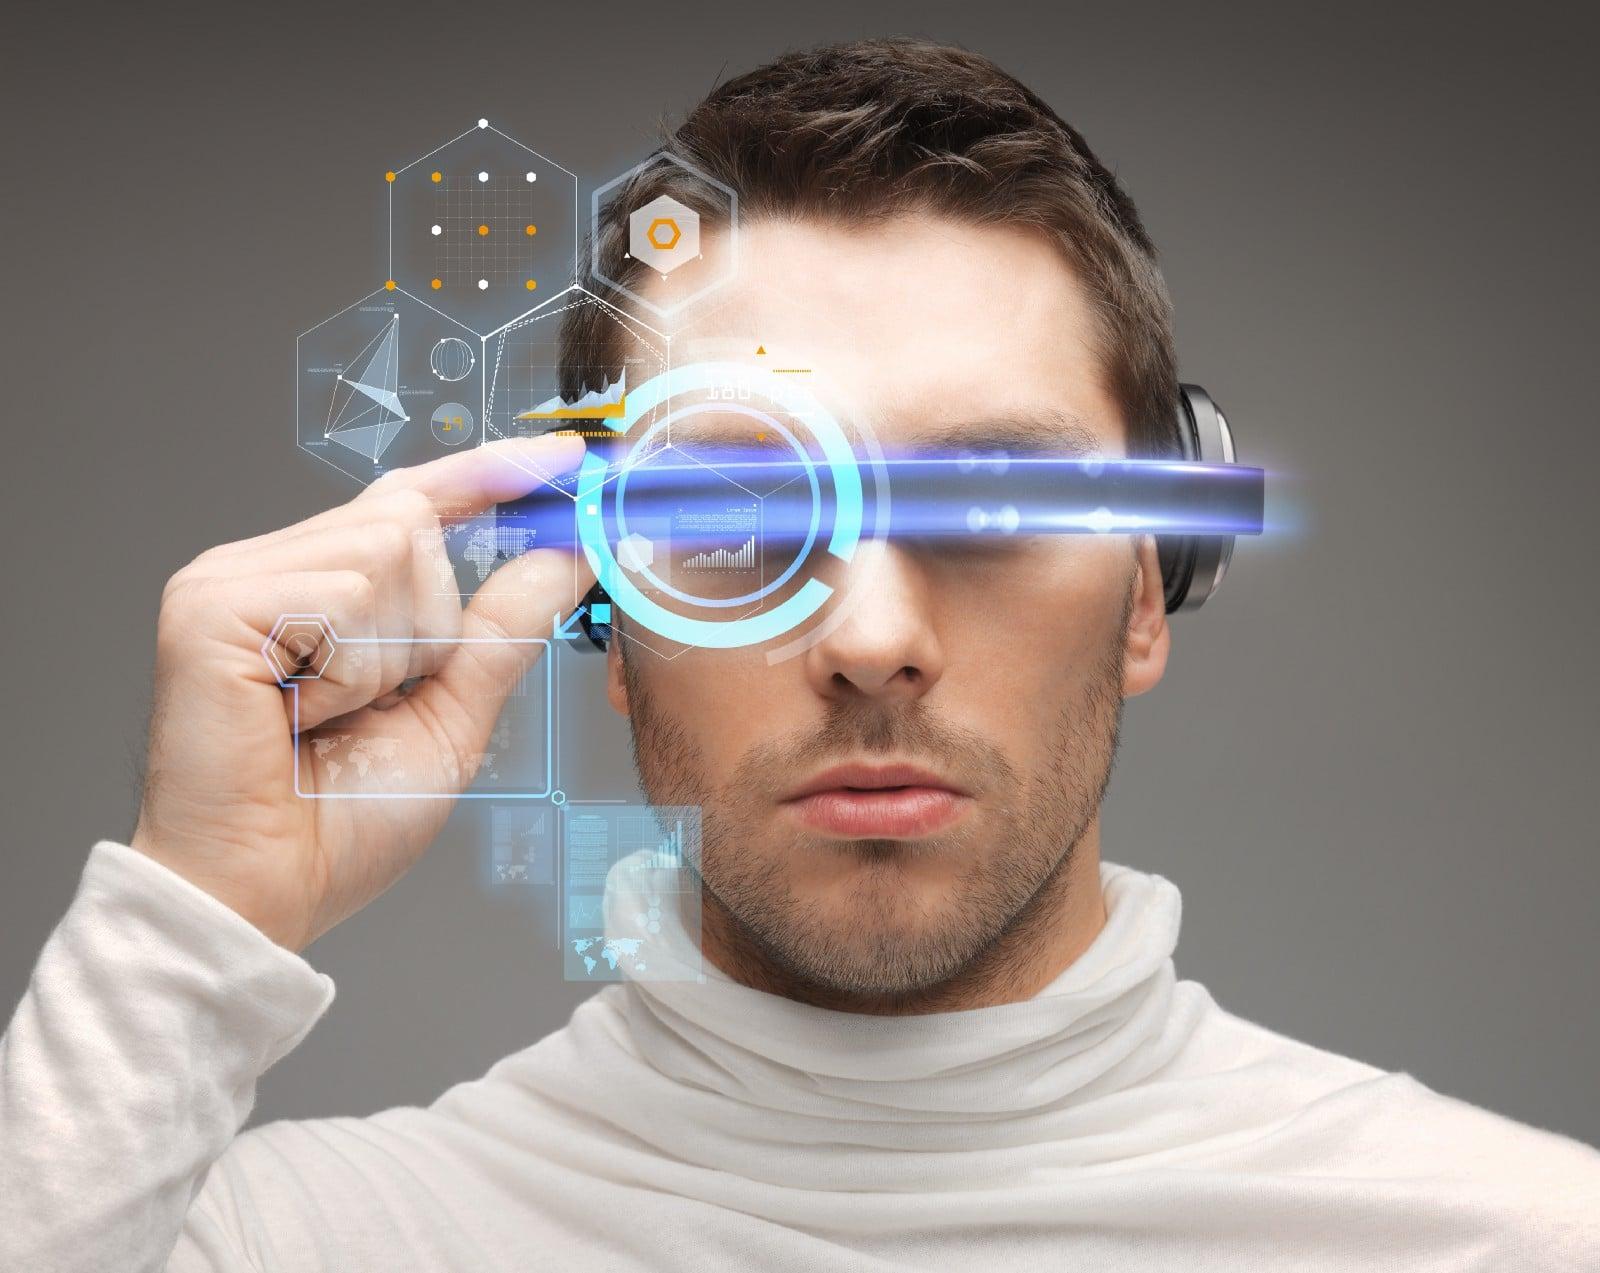 samsung lunettes connectees